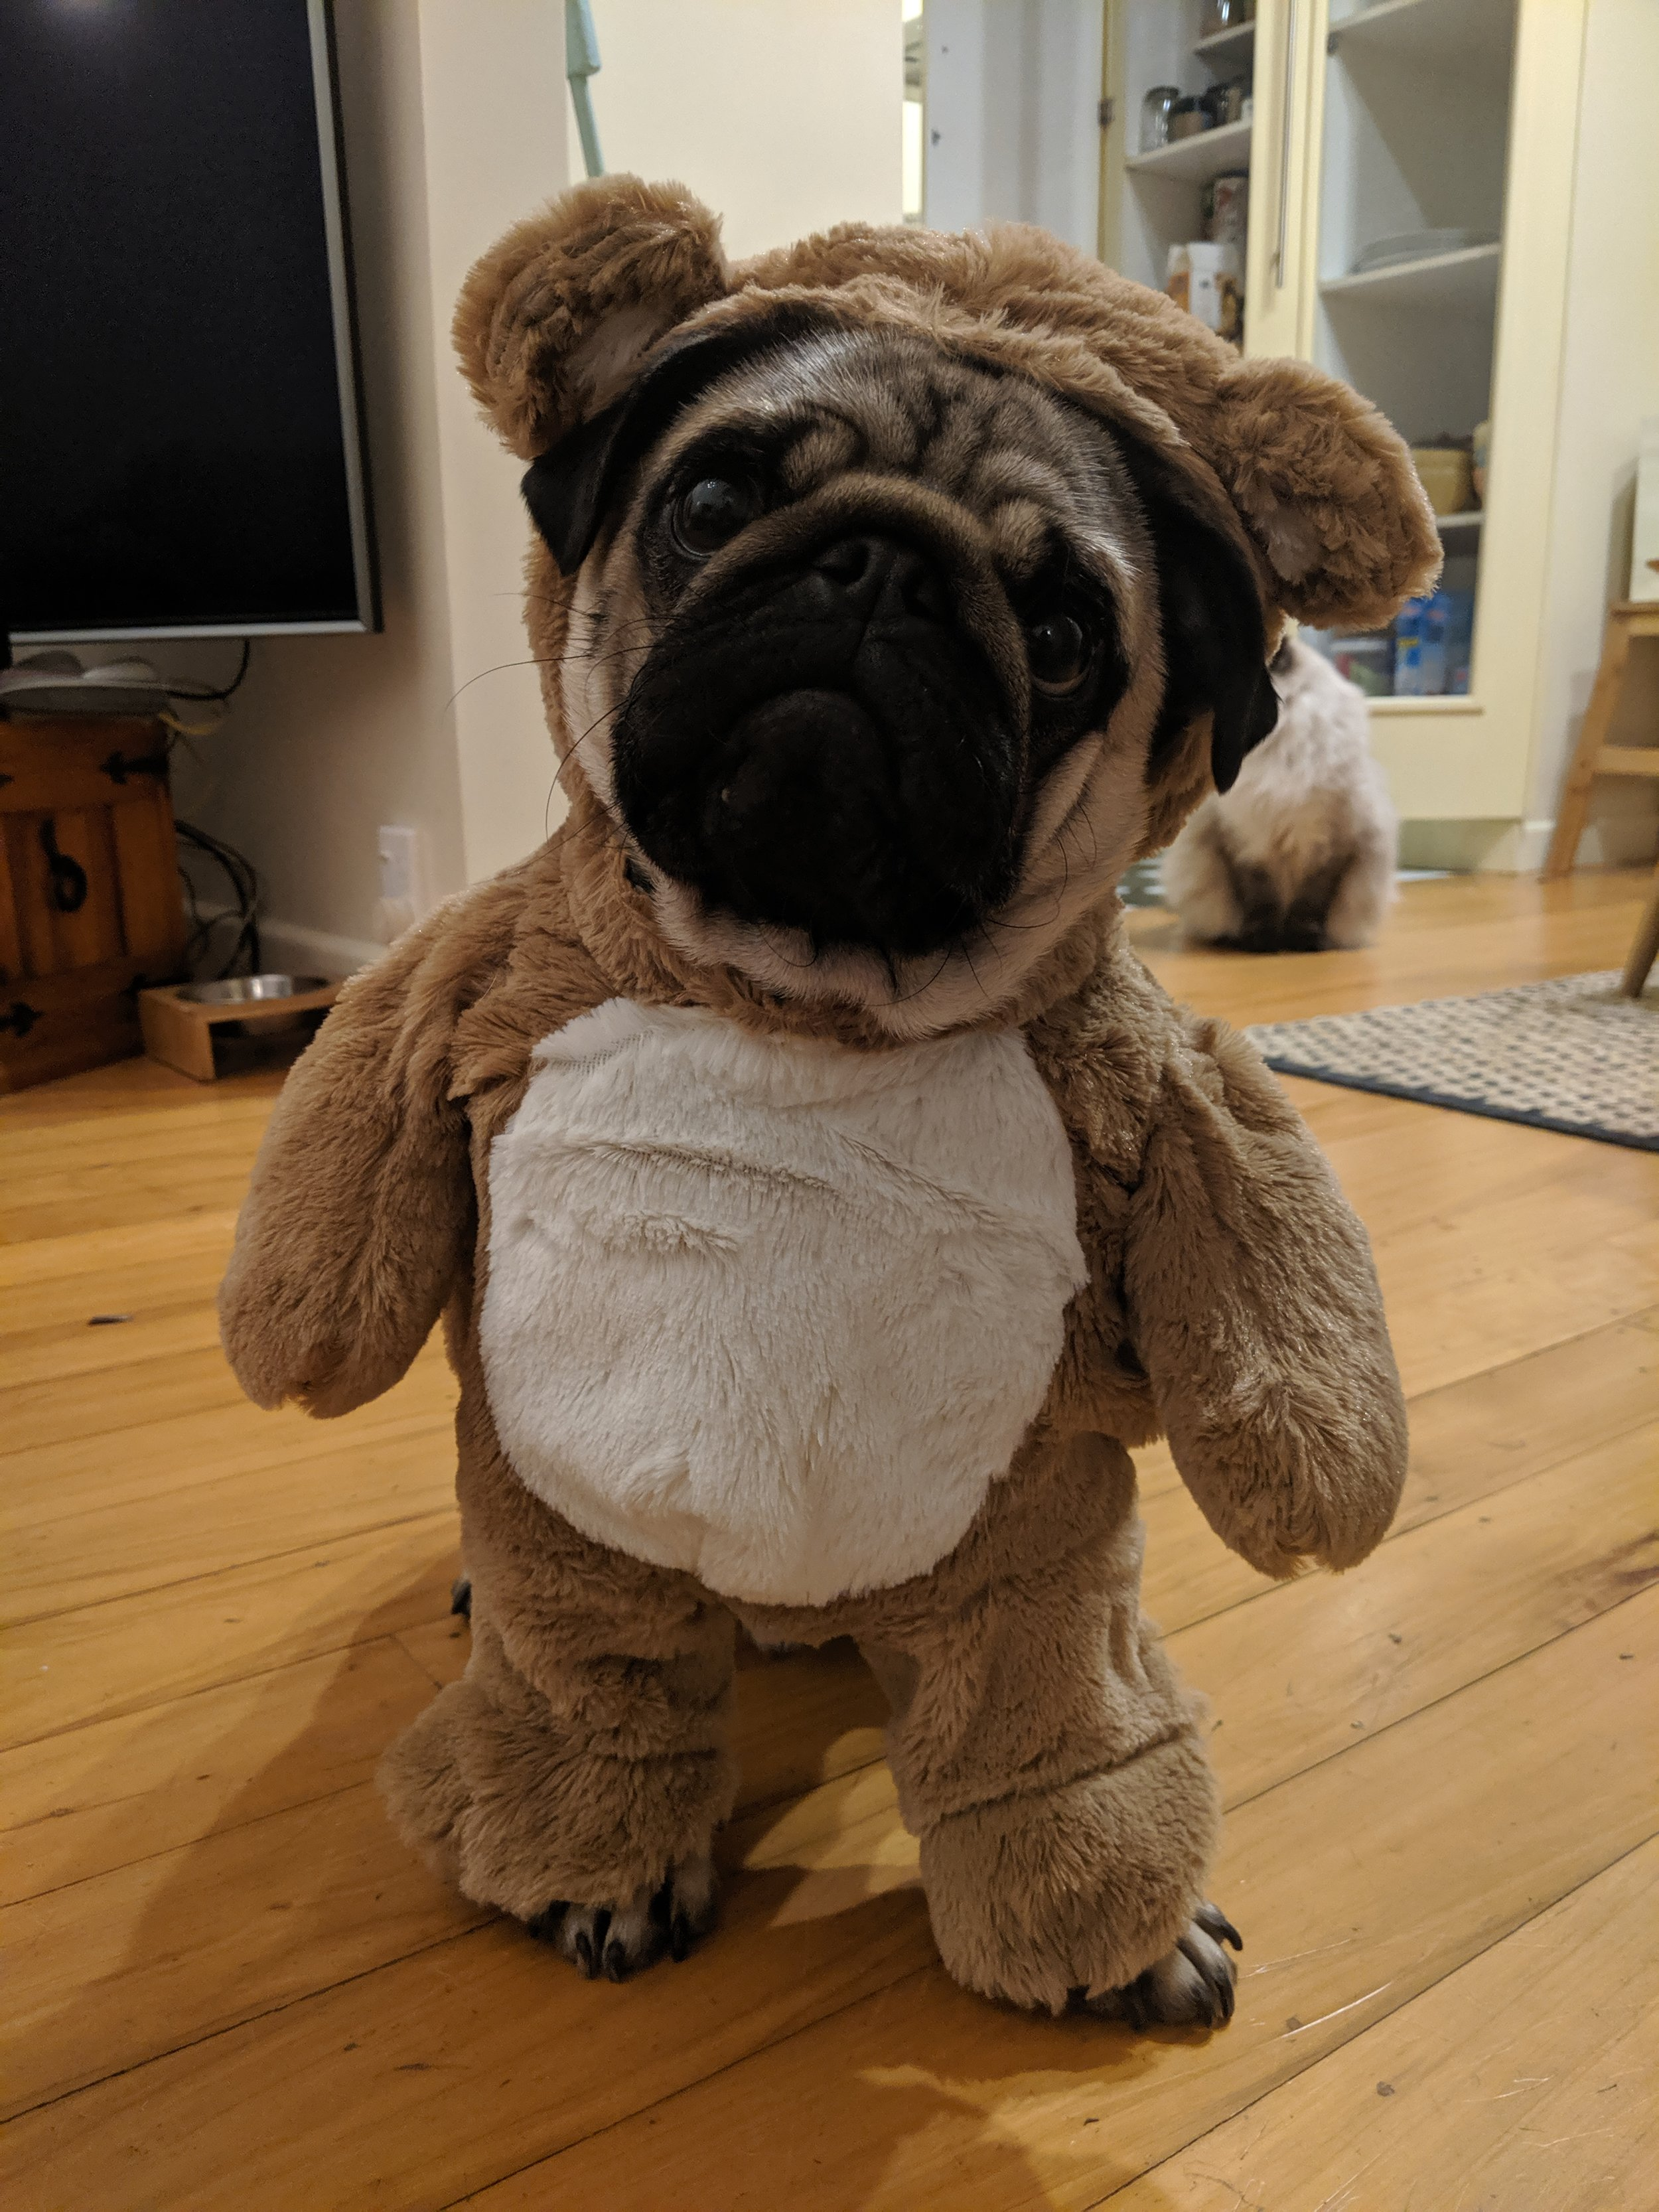 Alix's pug - Alphie wearing a bear costume